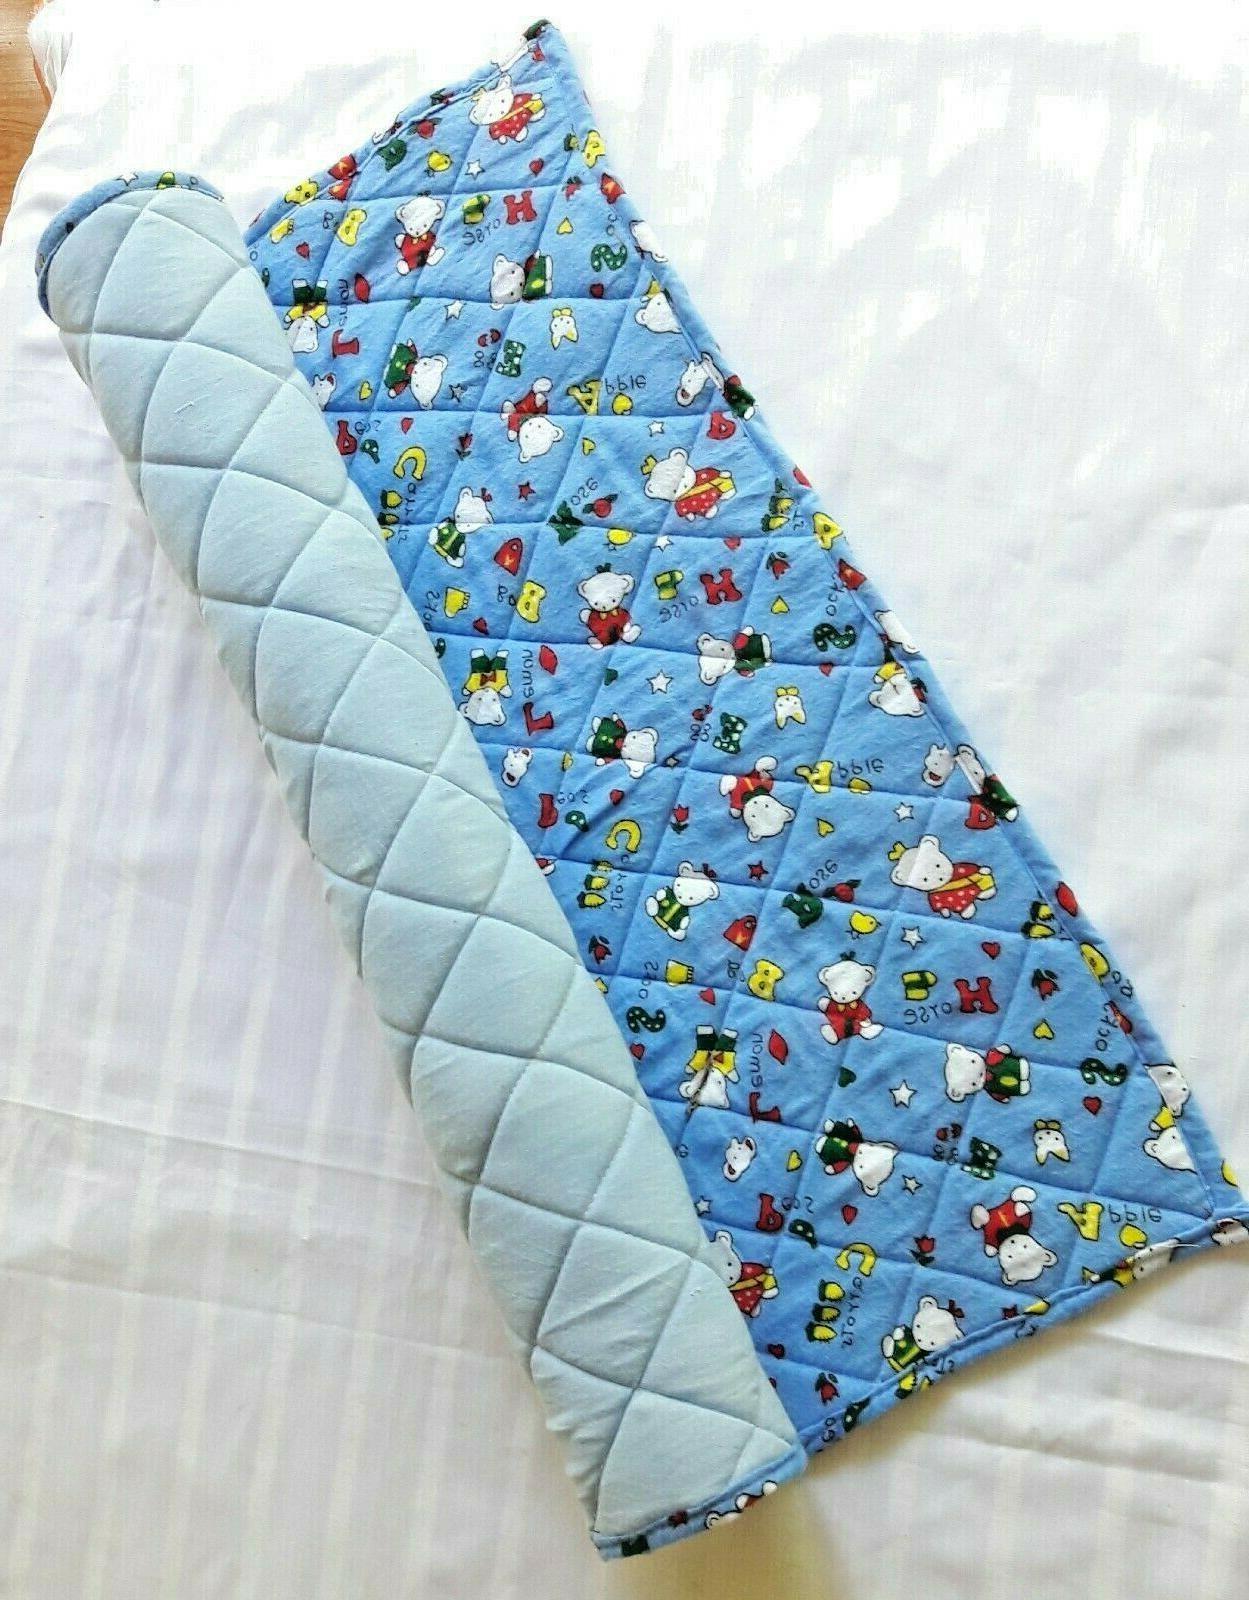 sponge baby travel cot sheet nursery bedding